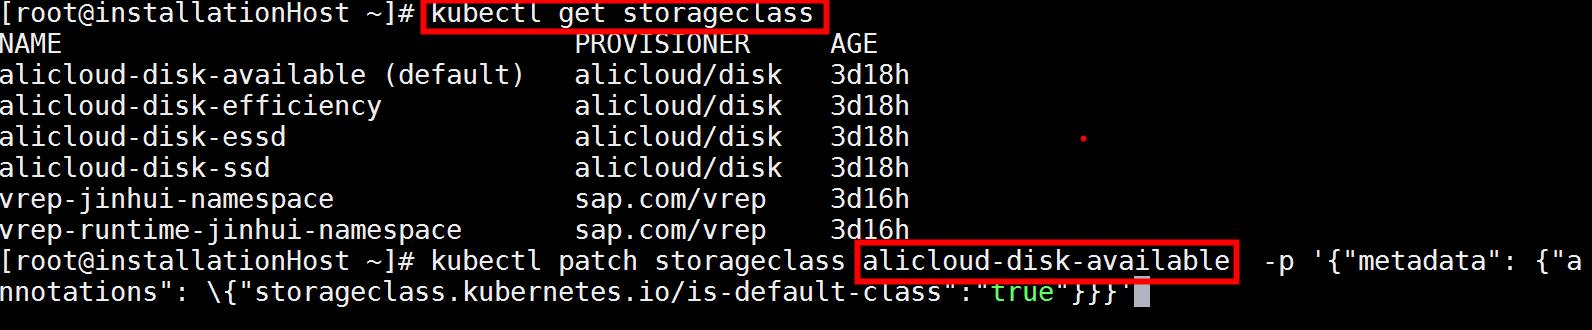 storageClass